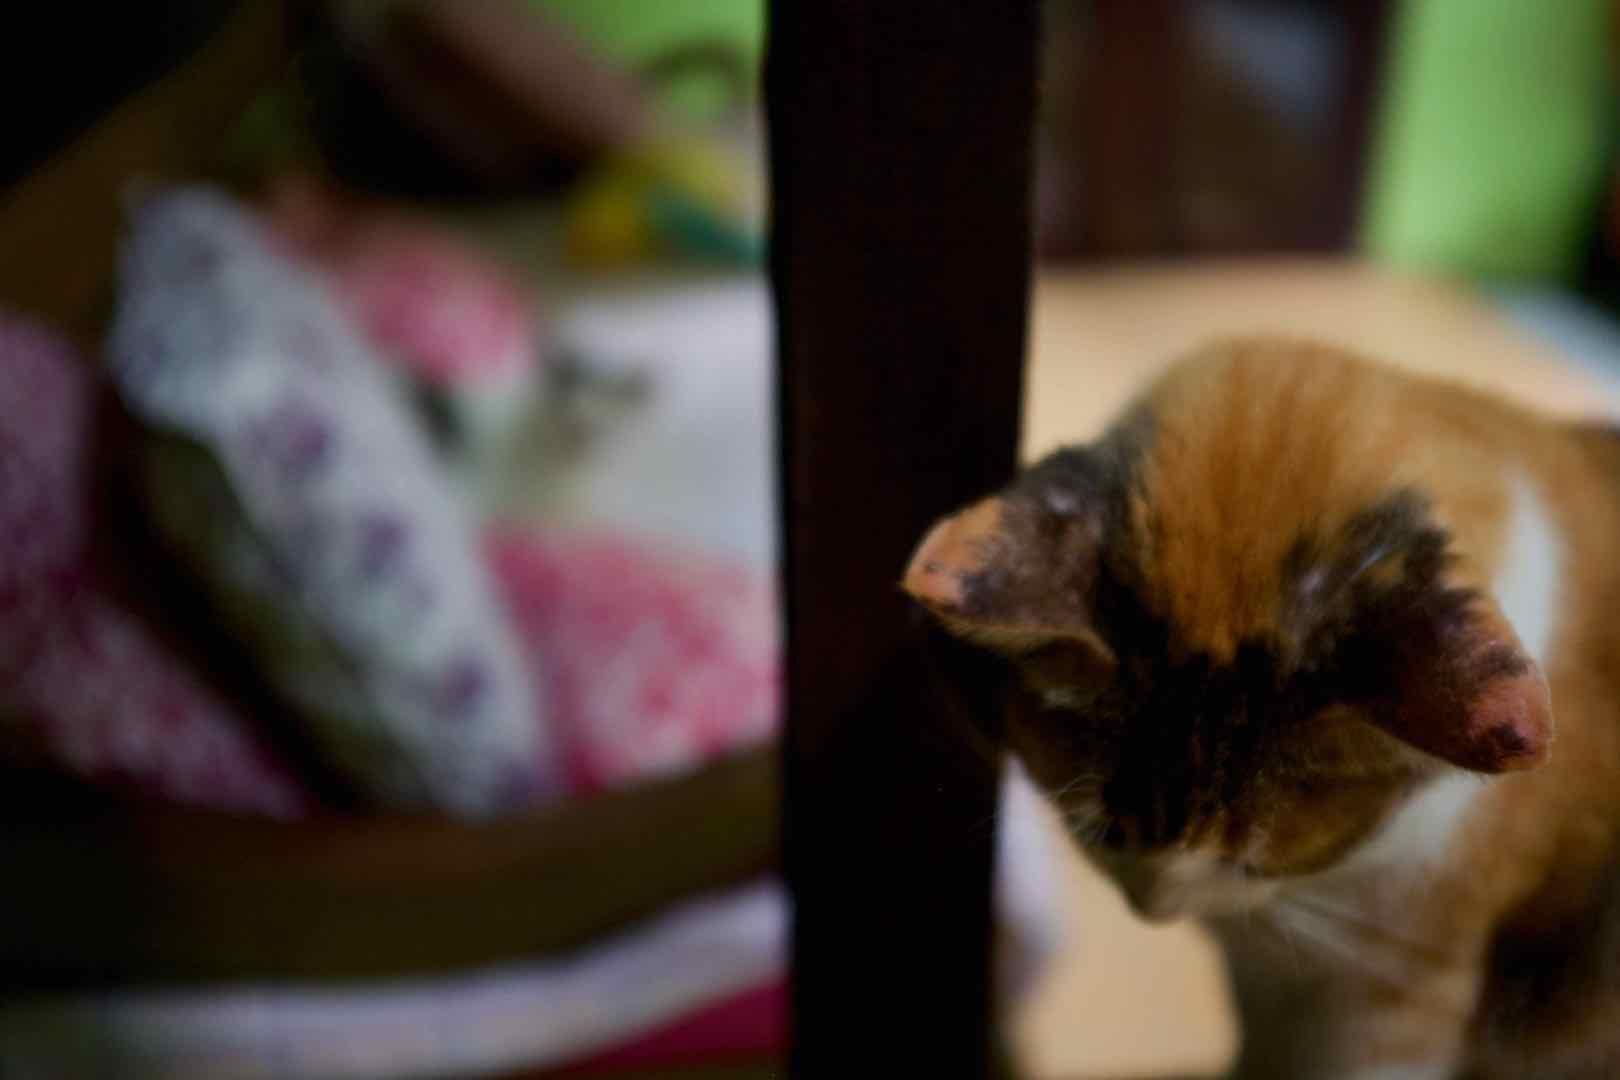 Villa Kitty Ubud Bali - Bali Street Photographer donation partner